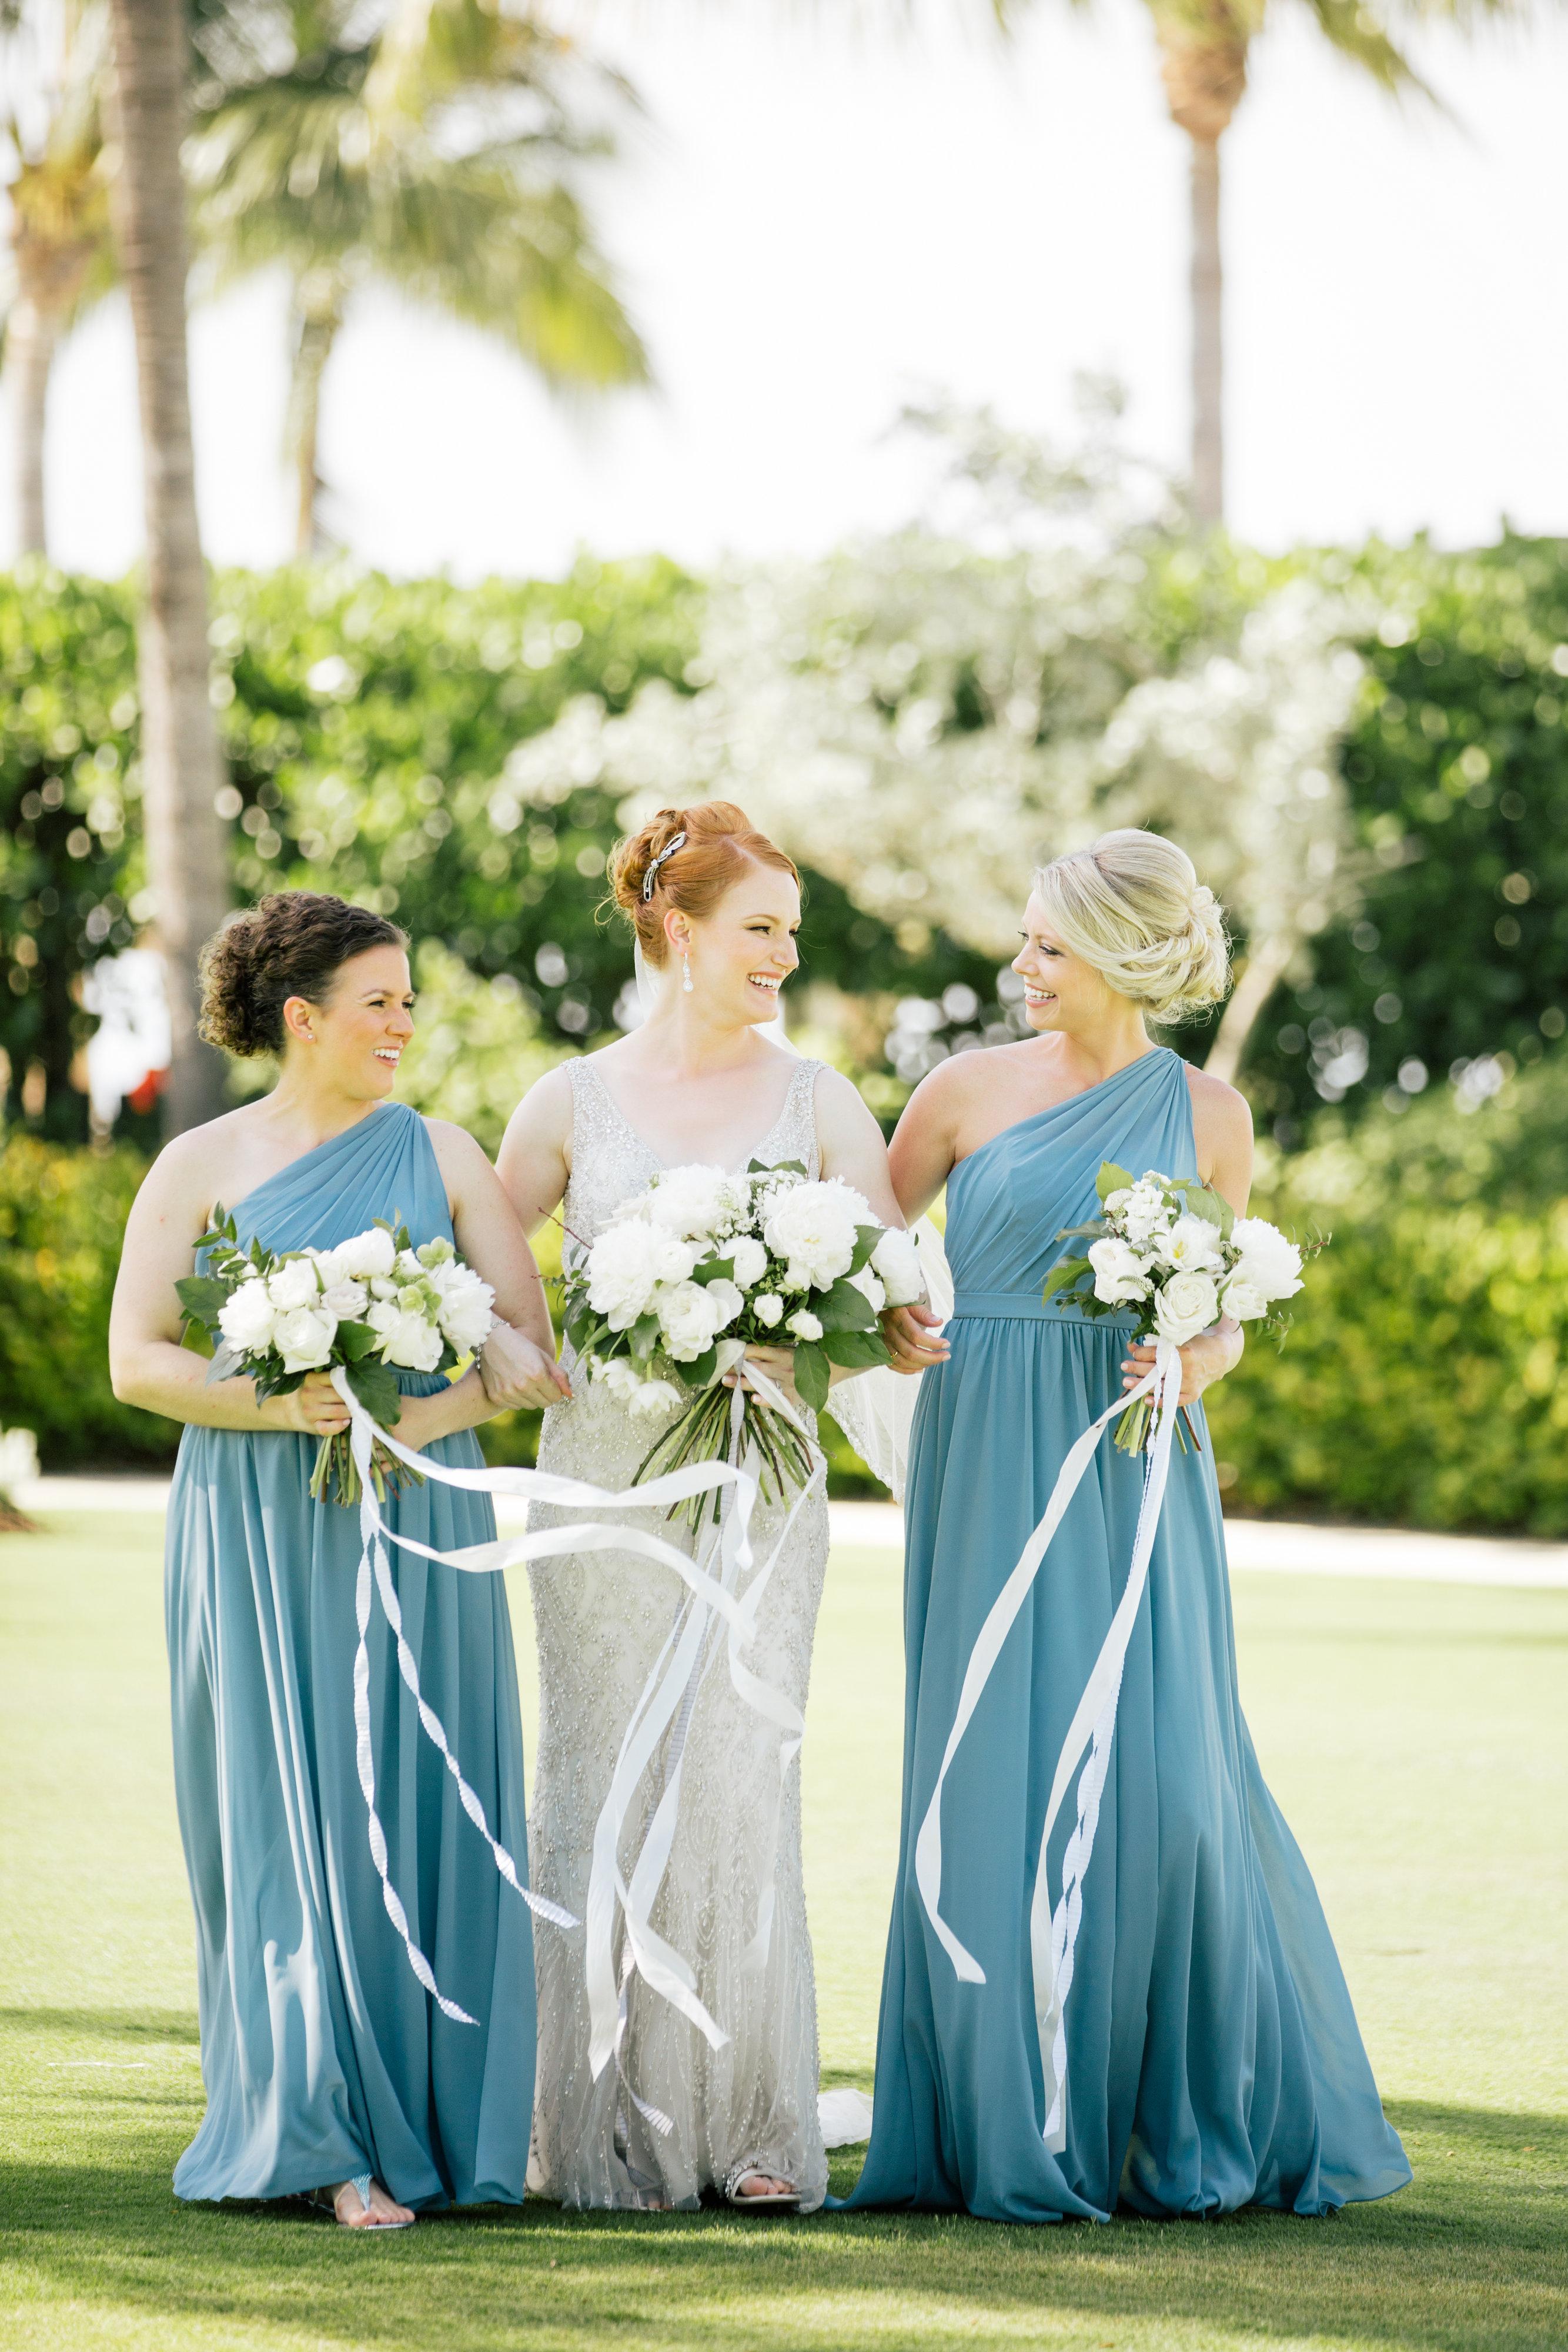 Bridesmaids in Cornflower Blue Dresses